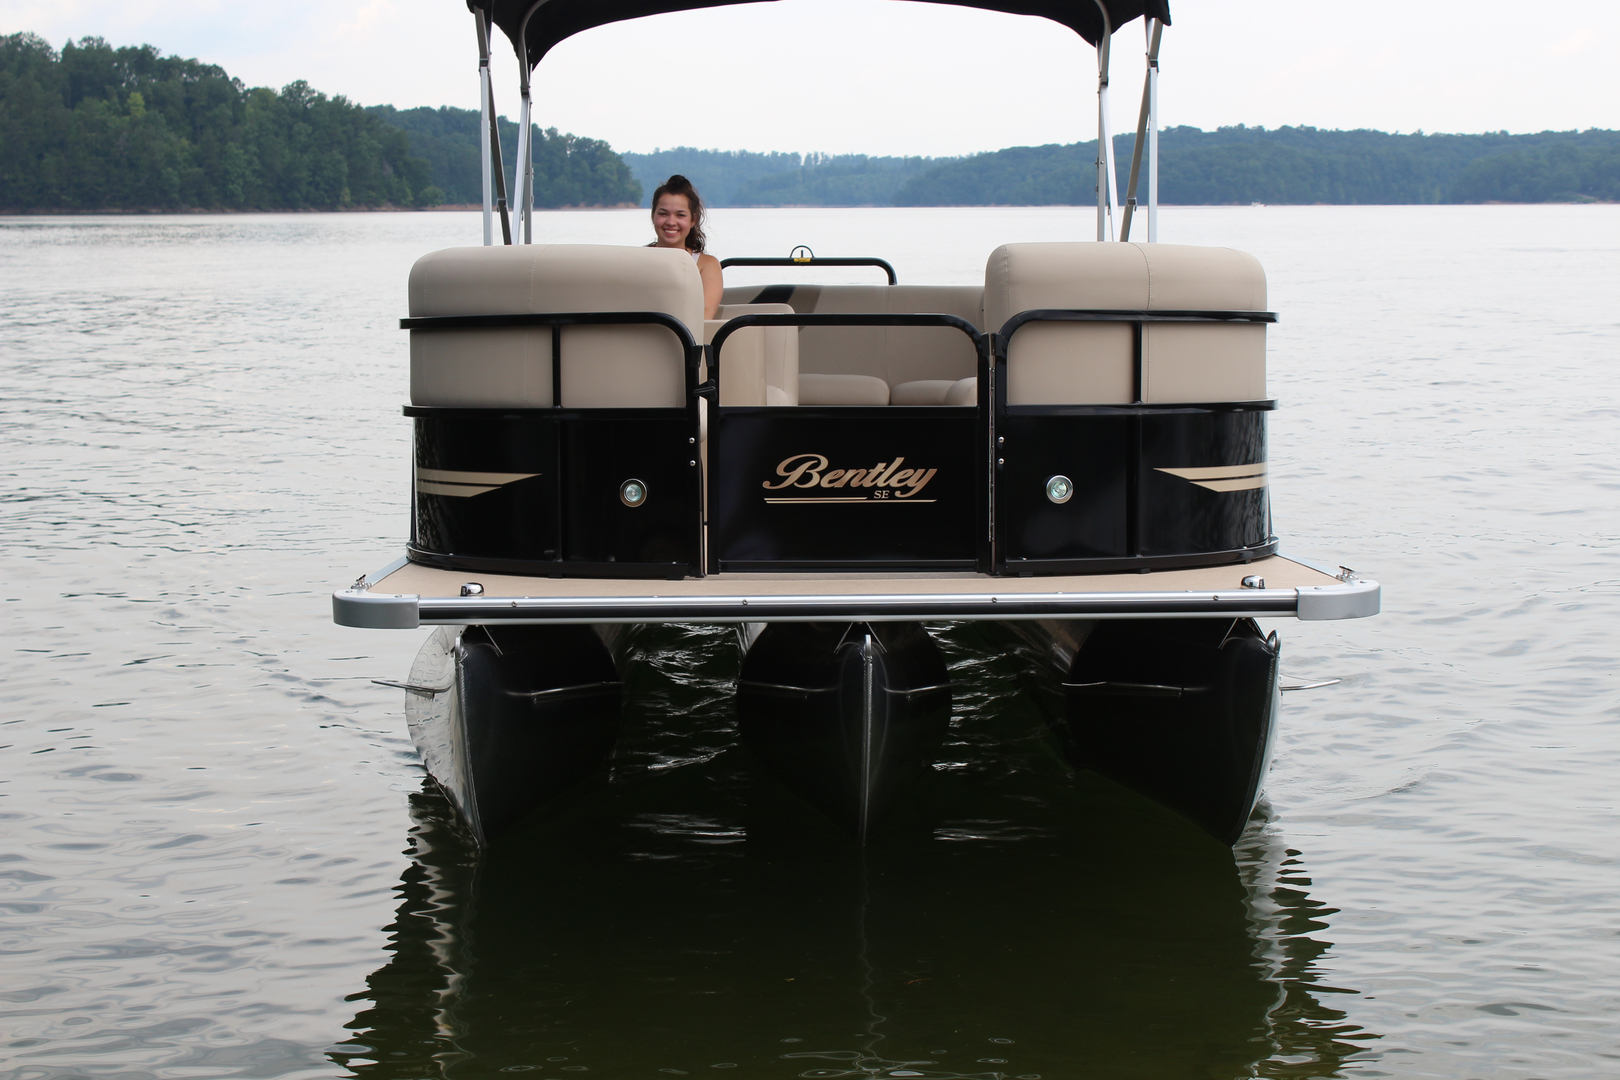 showcase s pontoons bentley camden dealers pontoon new in tn open lounger sale rear season elite marine for